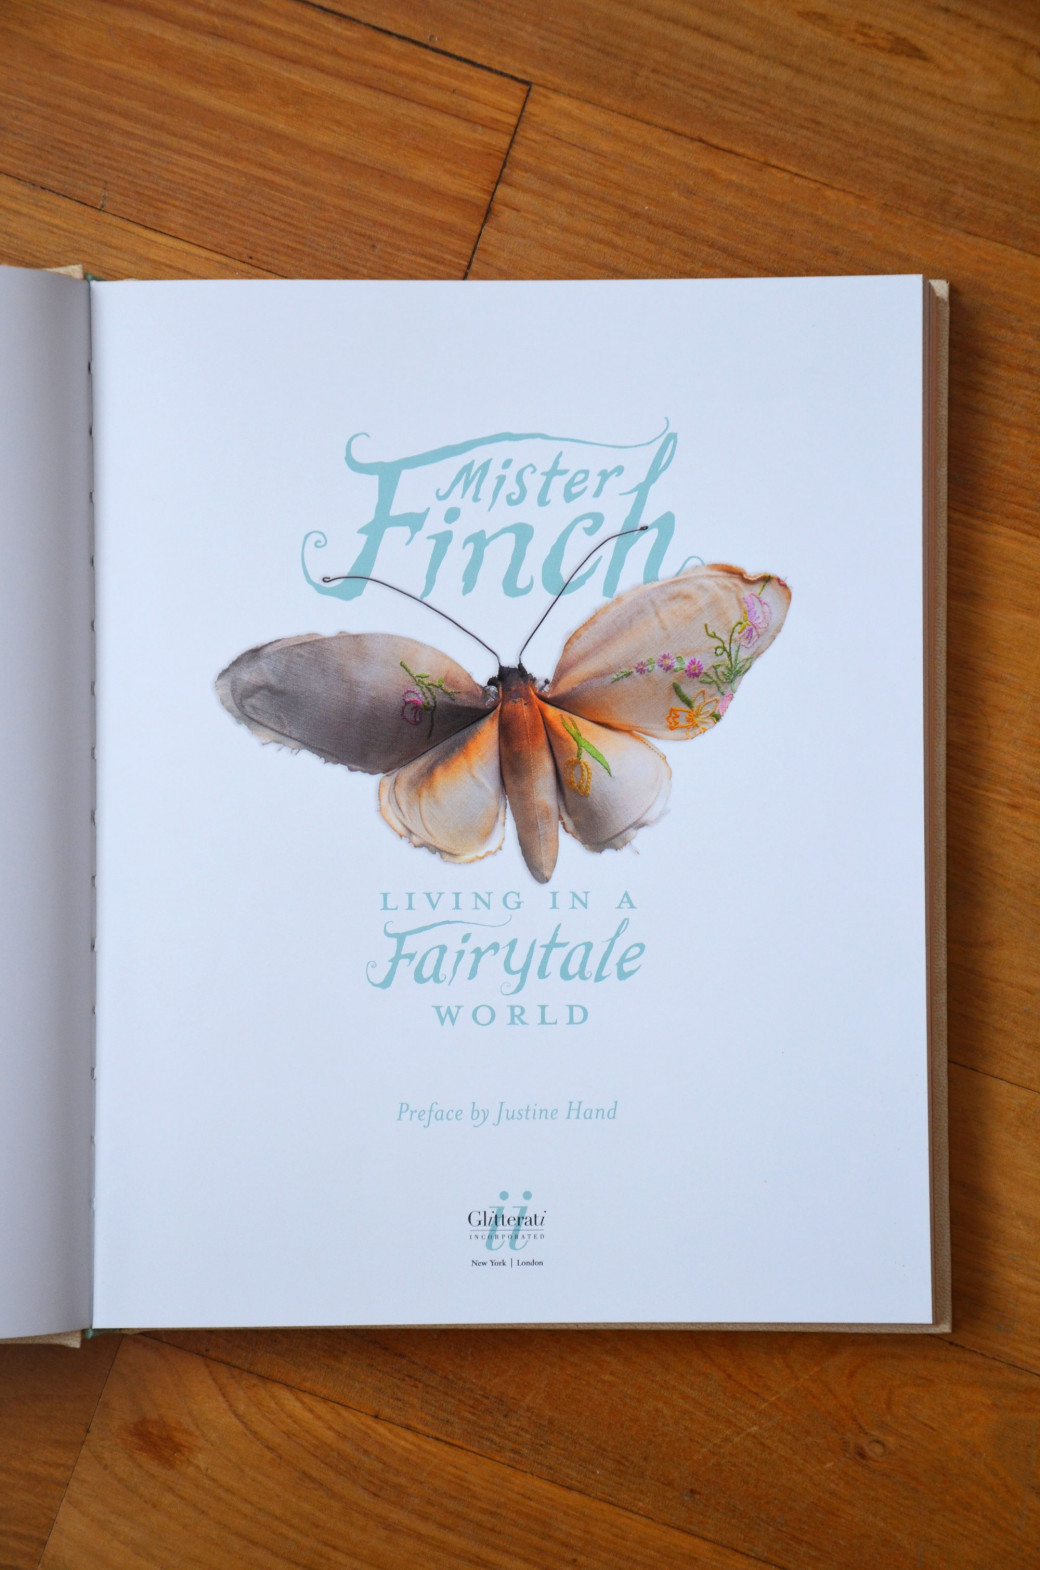 Extrait du livre «Living in a Fairytale World» de Mister Finch